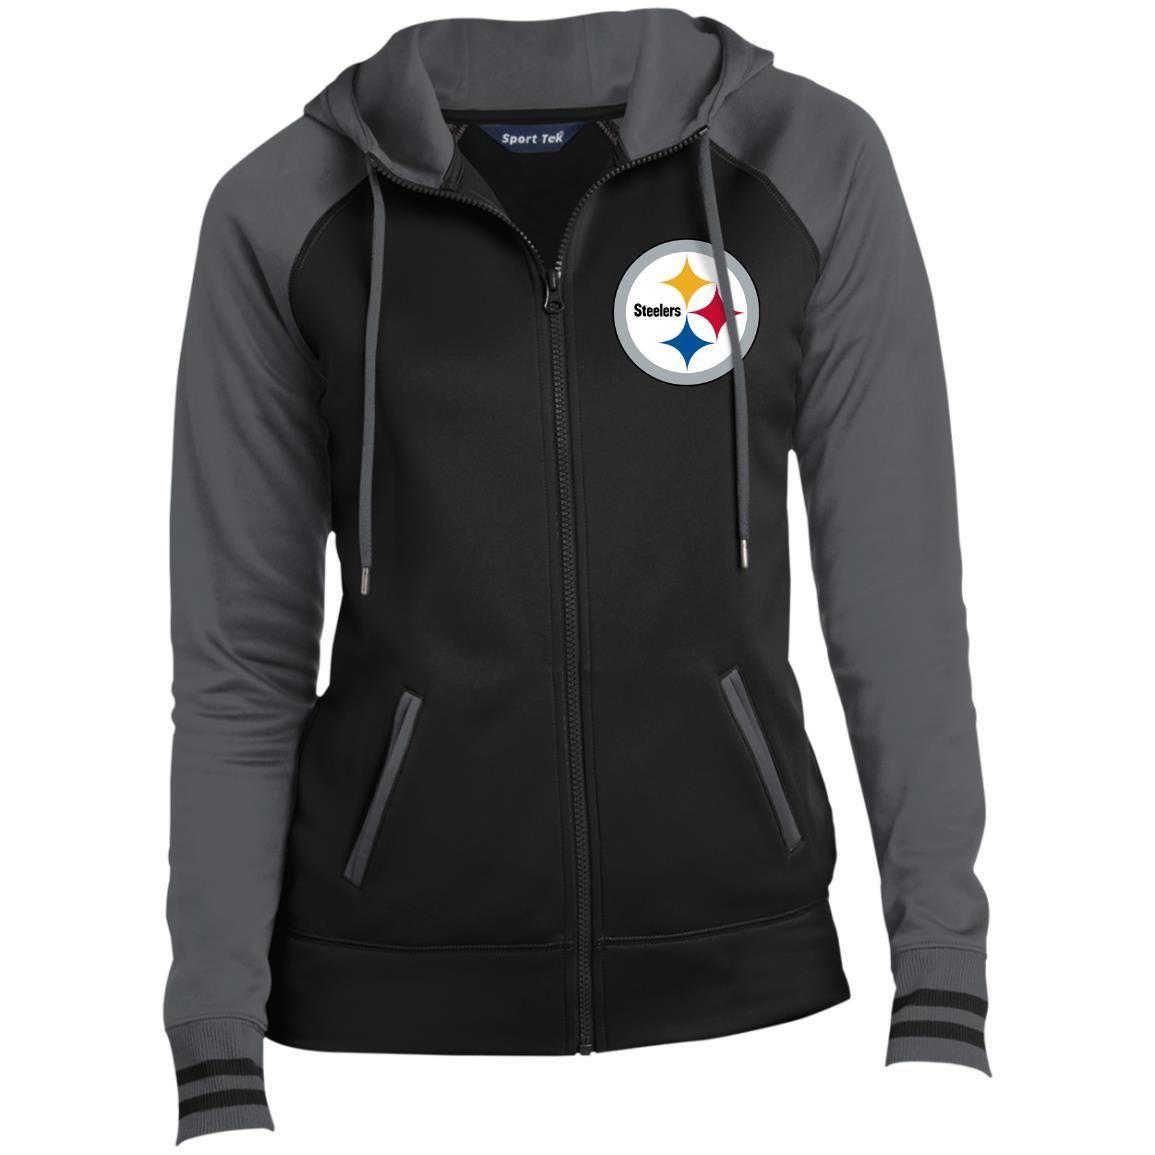 Pittsburgh Steelers Nfl Sport Tek Ladies Full Zip Hooded Jacket Check More At Https Lapomm Nfl Sports Hooded Jacket Jackets Comprehensive national football league news, scores, standings, fantasy games, rumors, and more. pinterest